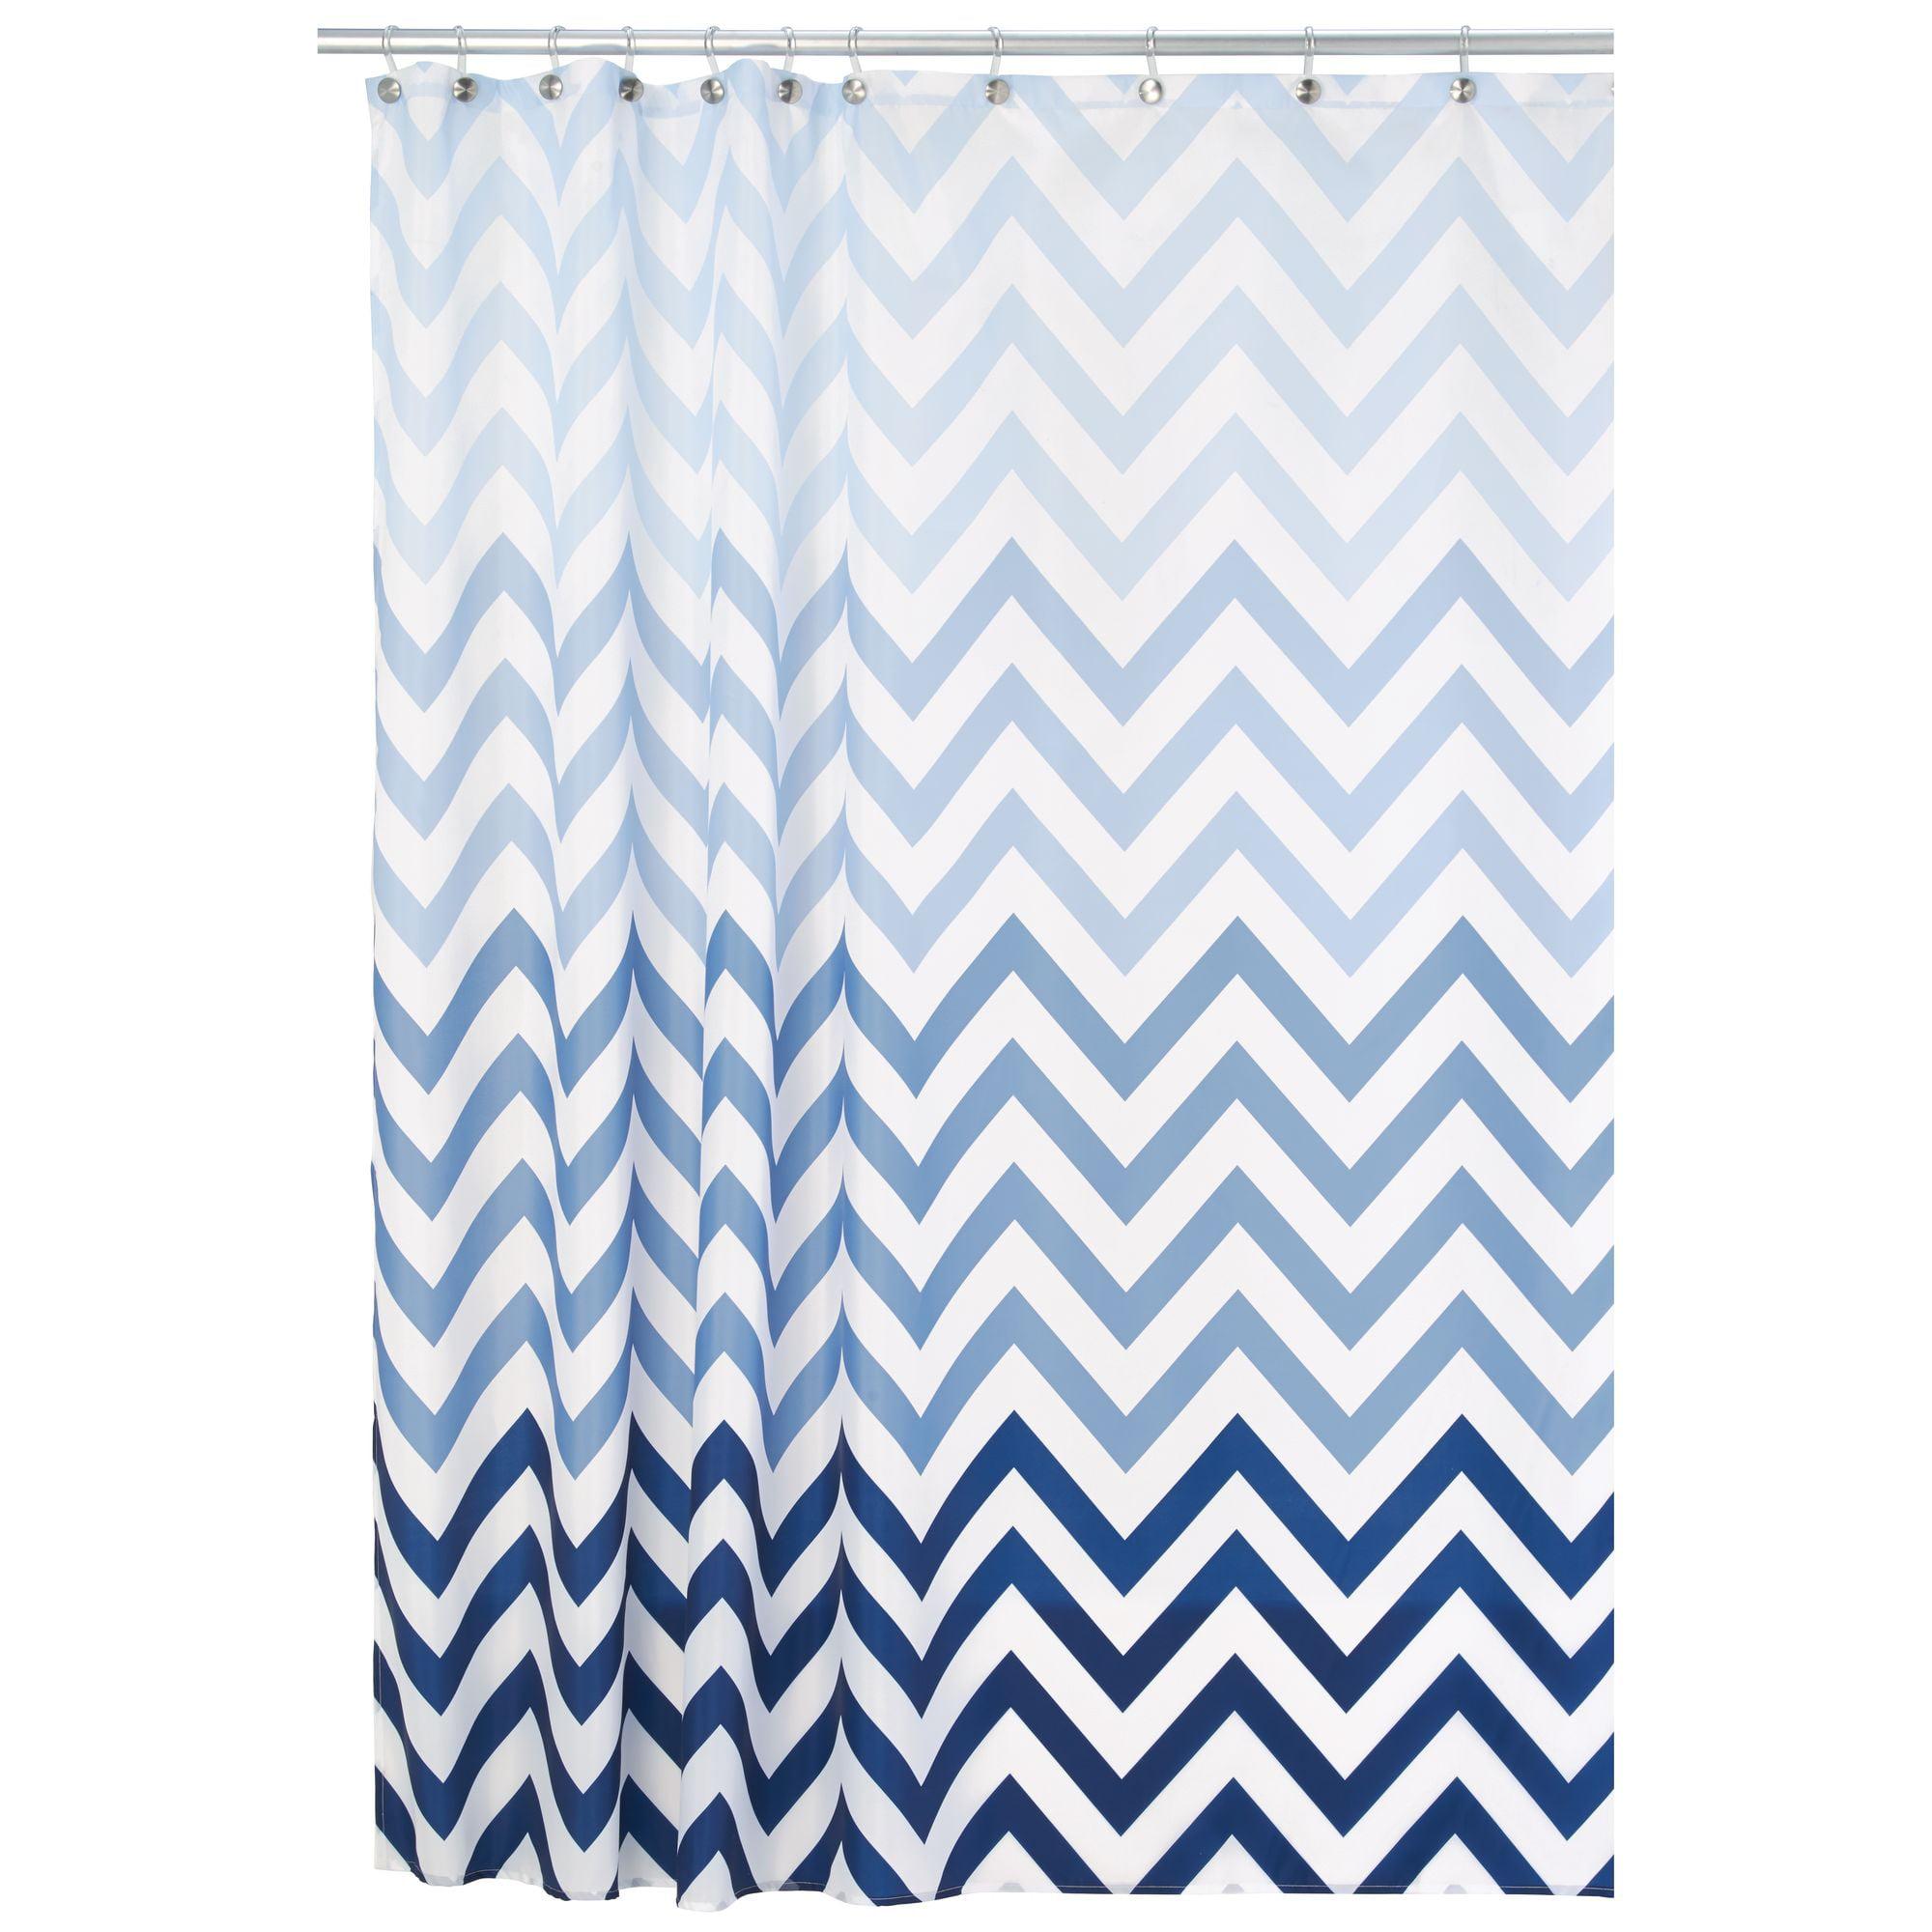 Interdesign Ombre Chevron Fabric Shower Curtain Standard 72 X 72